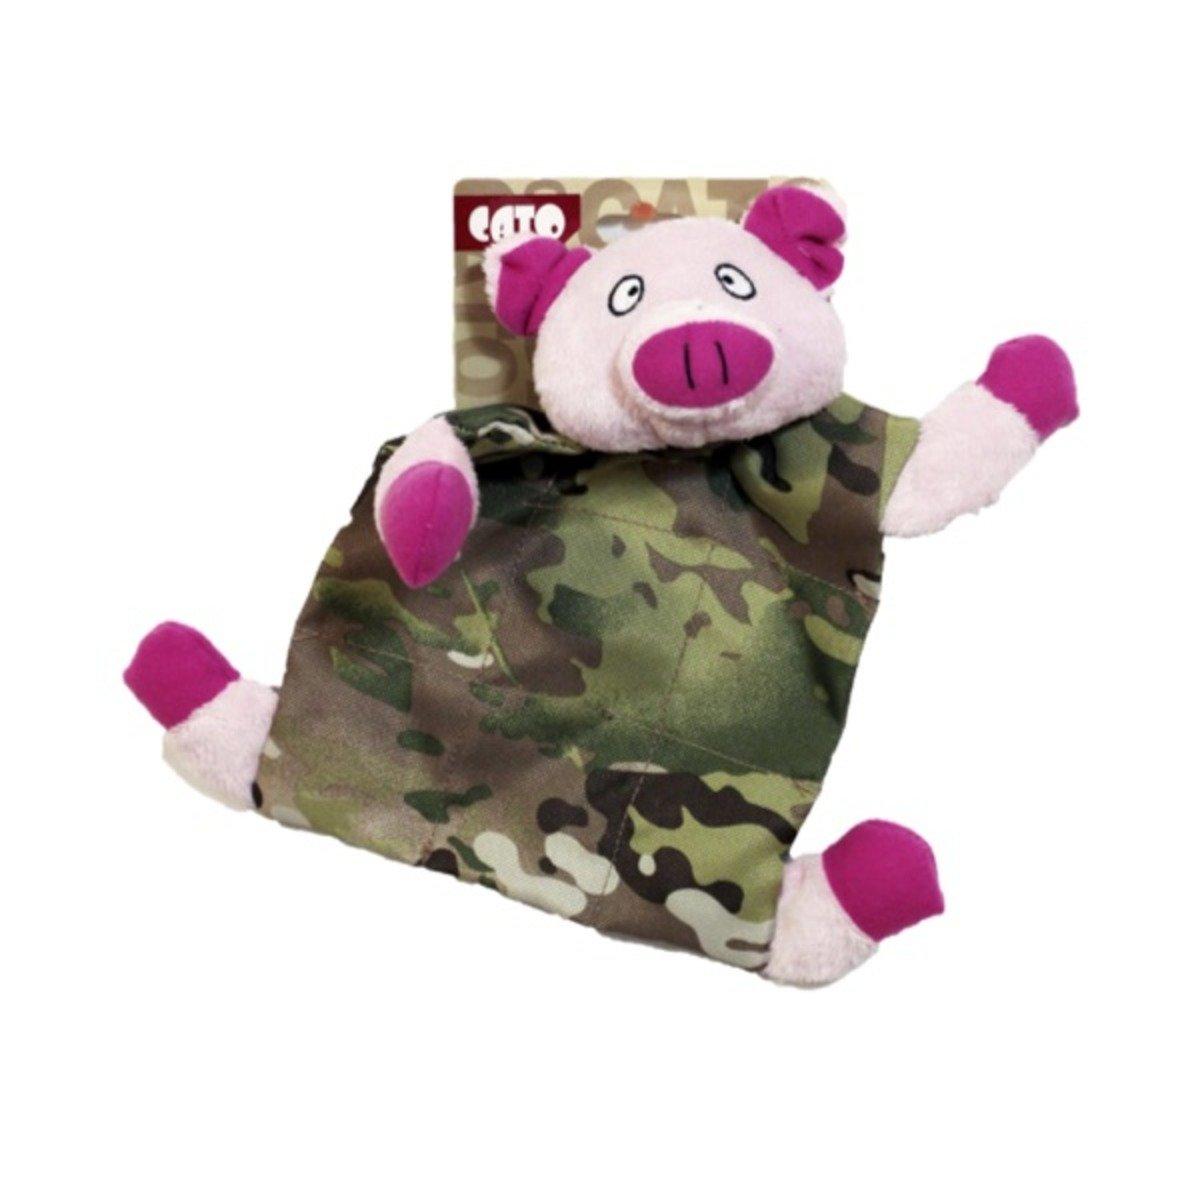 Love Pet 迷彩豬仔咇咇玩具